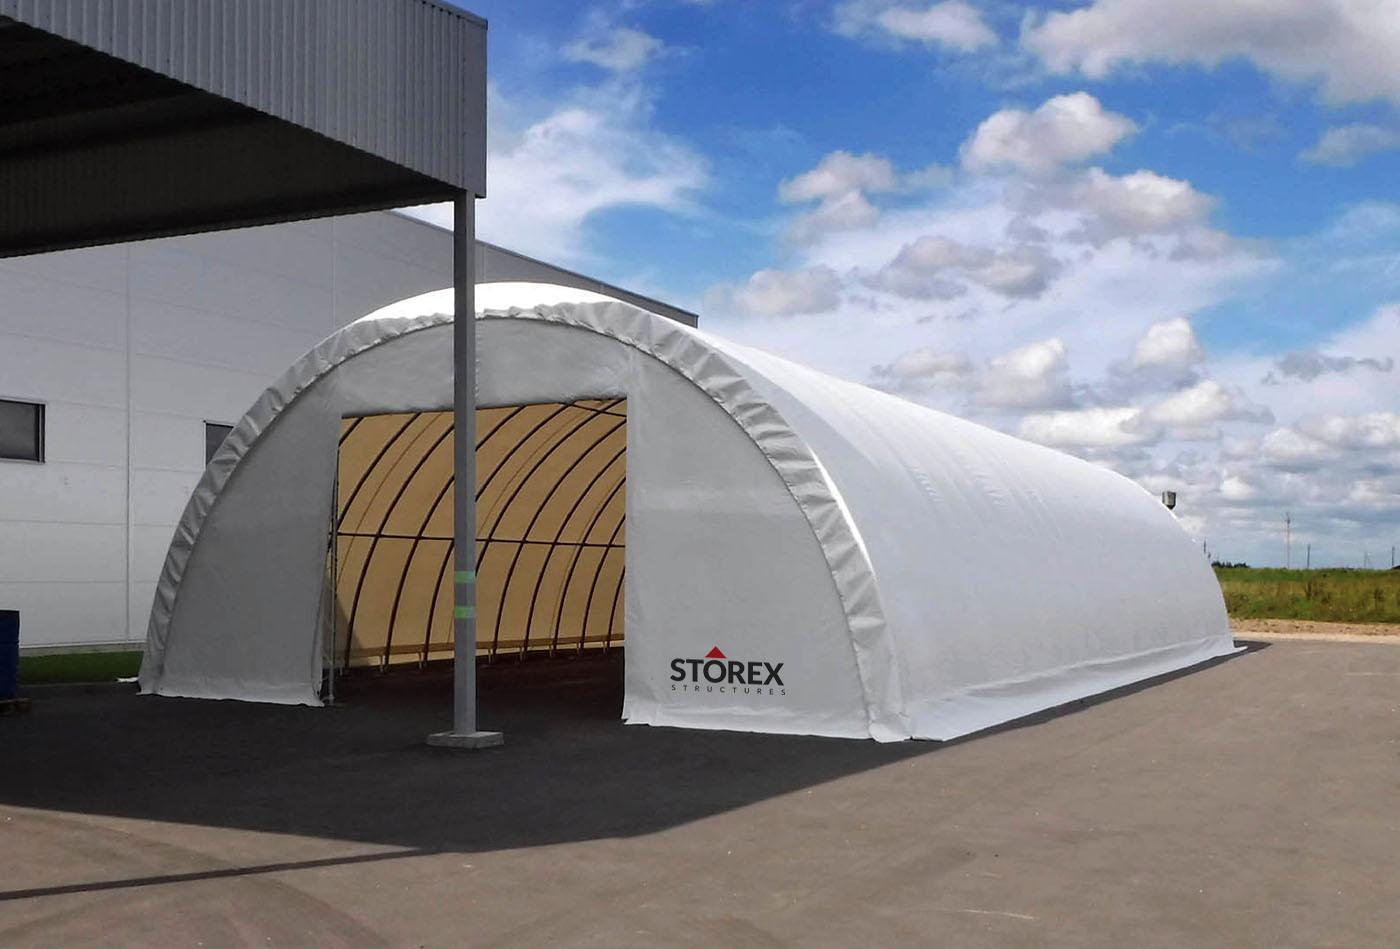 STOREX tent-hangar-ULA-110